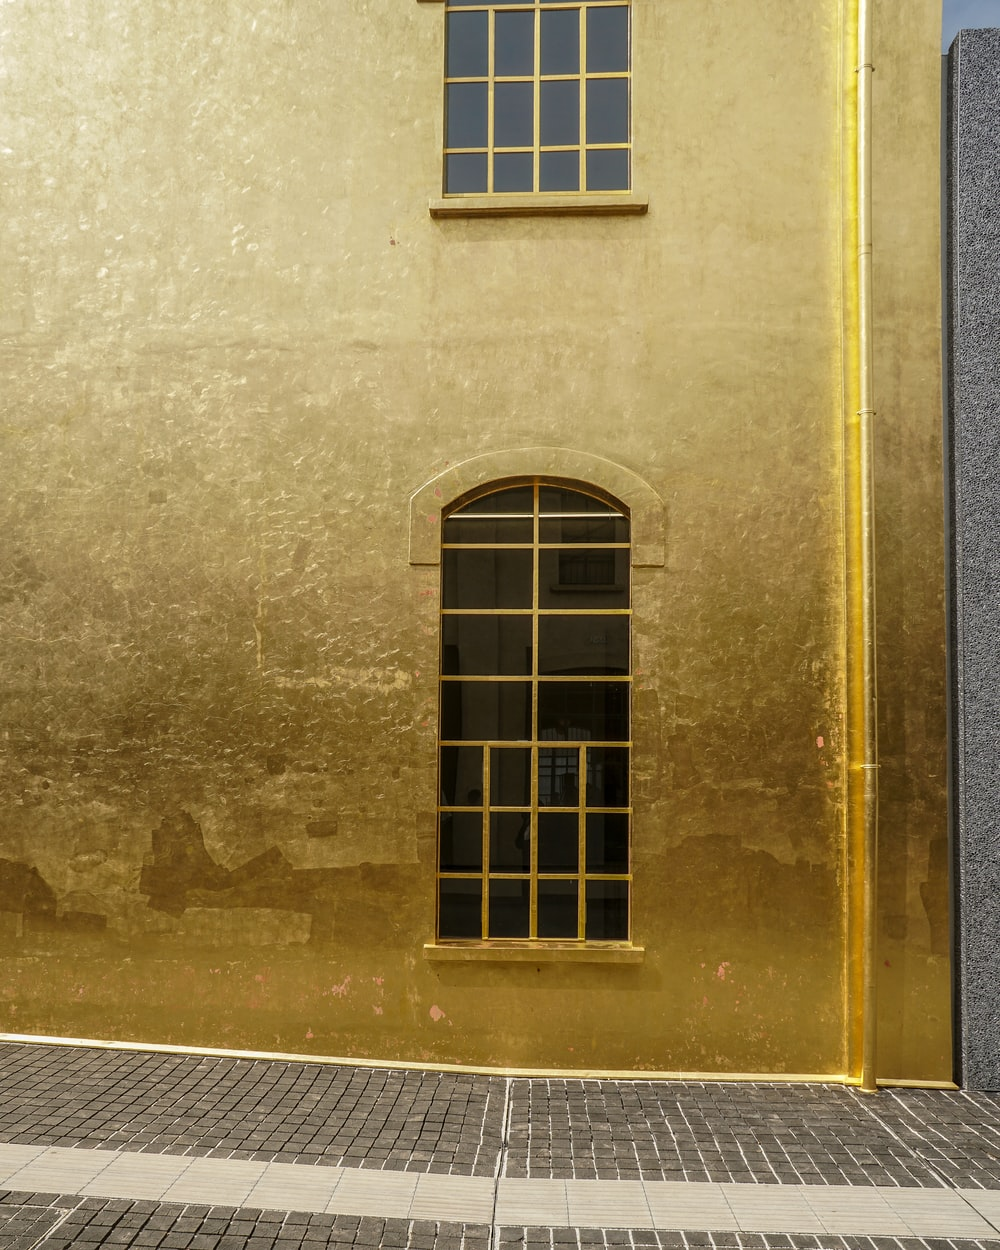 gold-colored concrete building